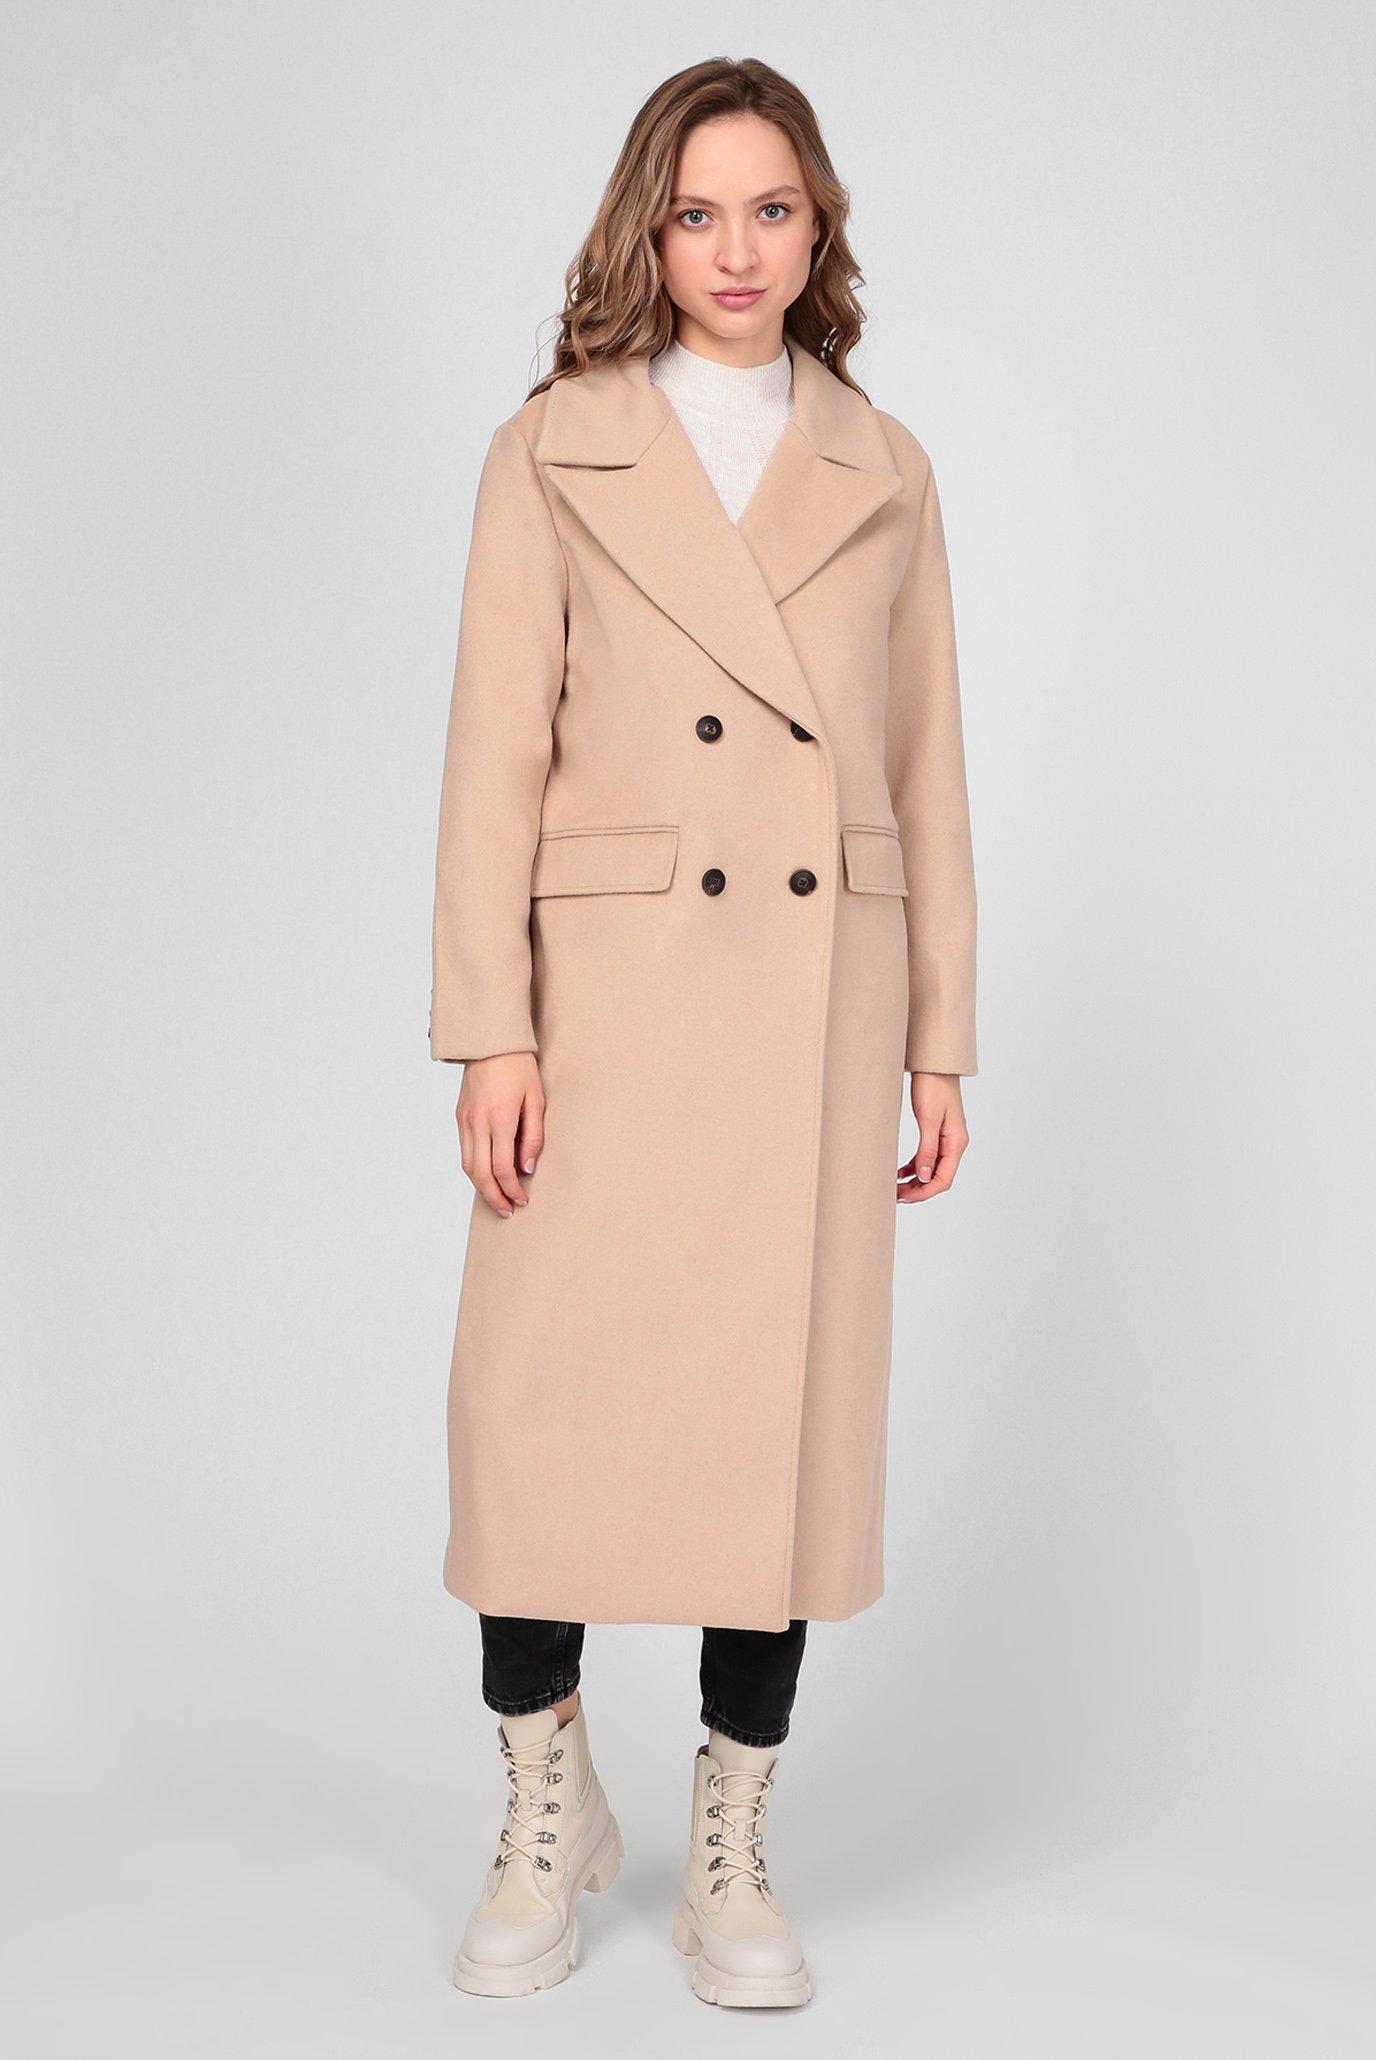 Жіноче бежеве вовняне пальто MARA 1